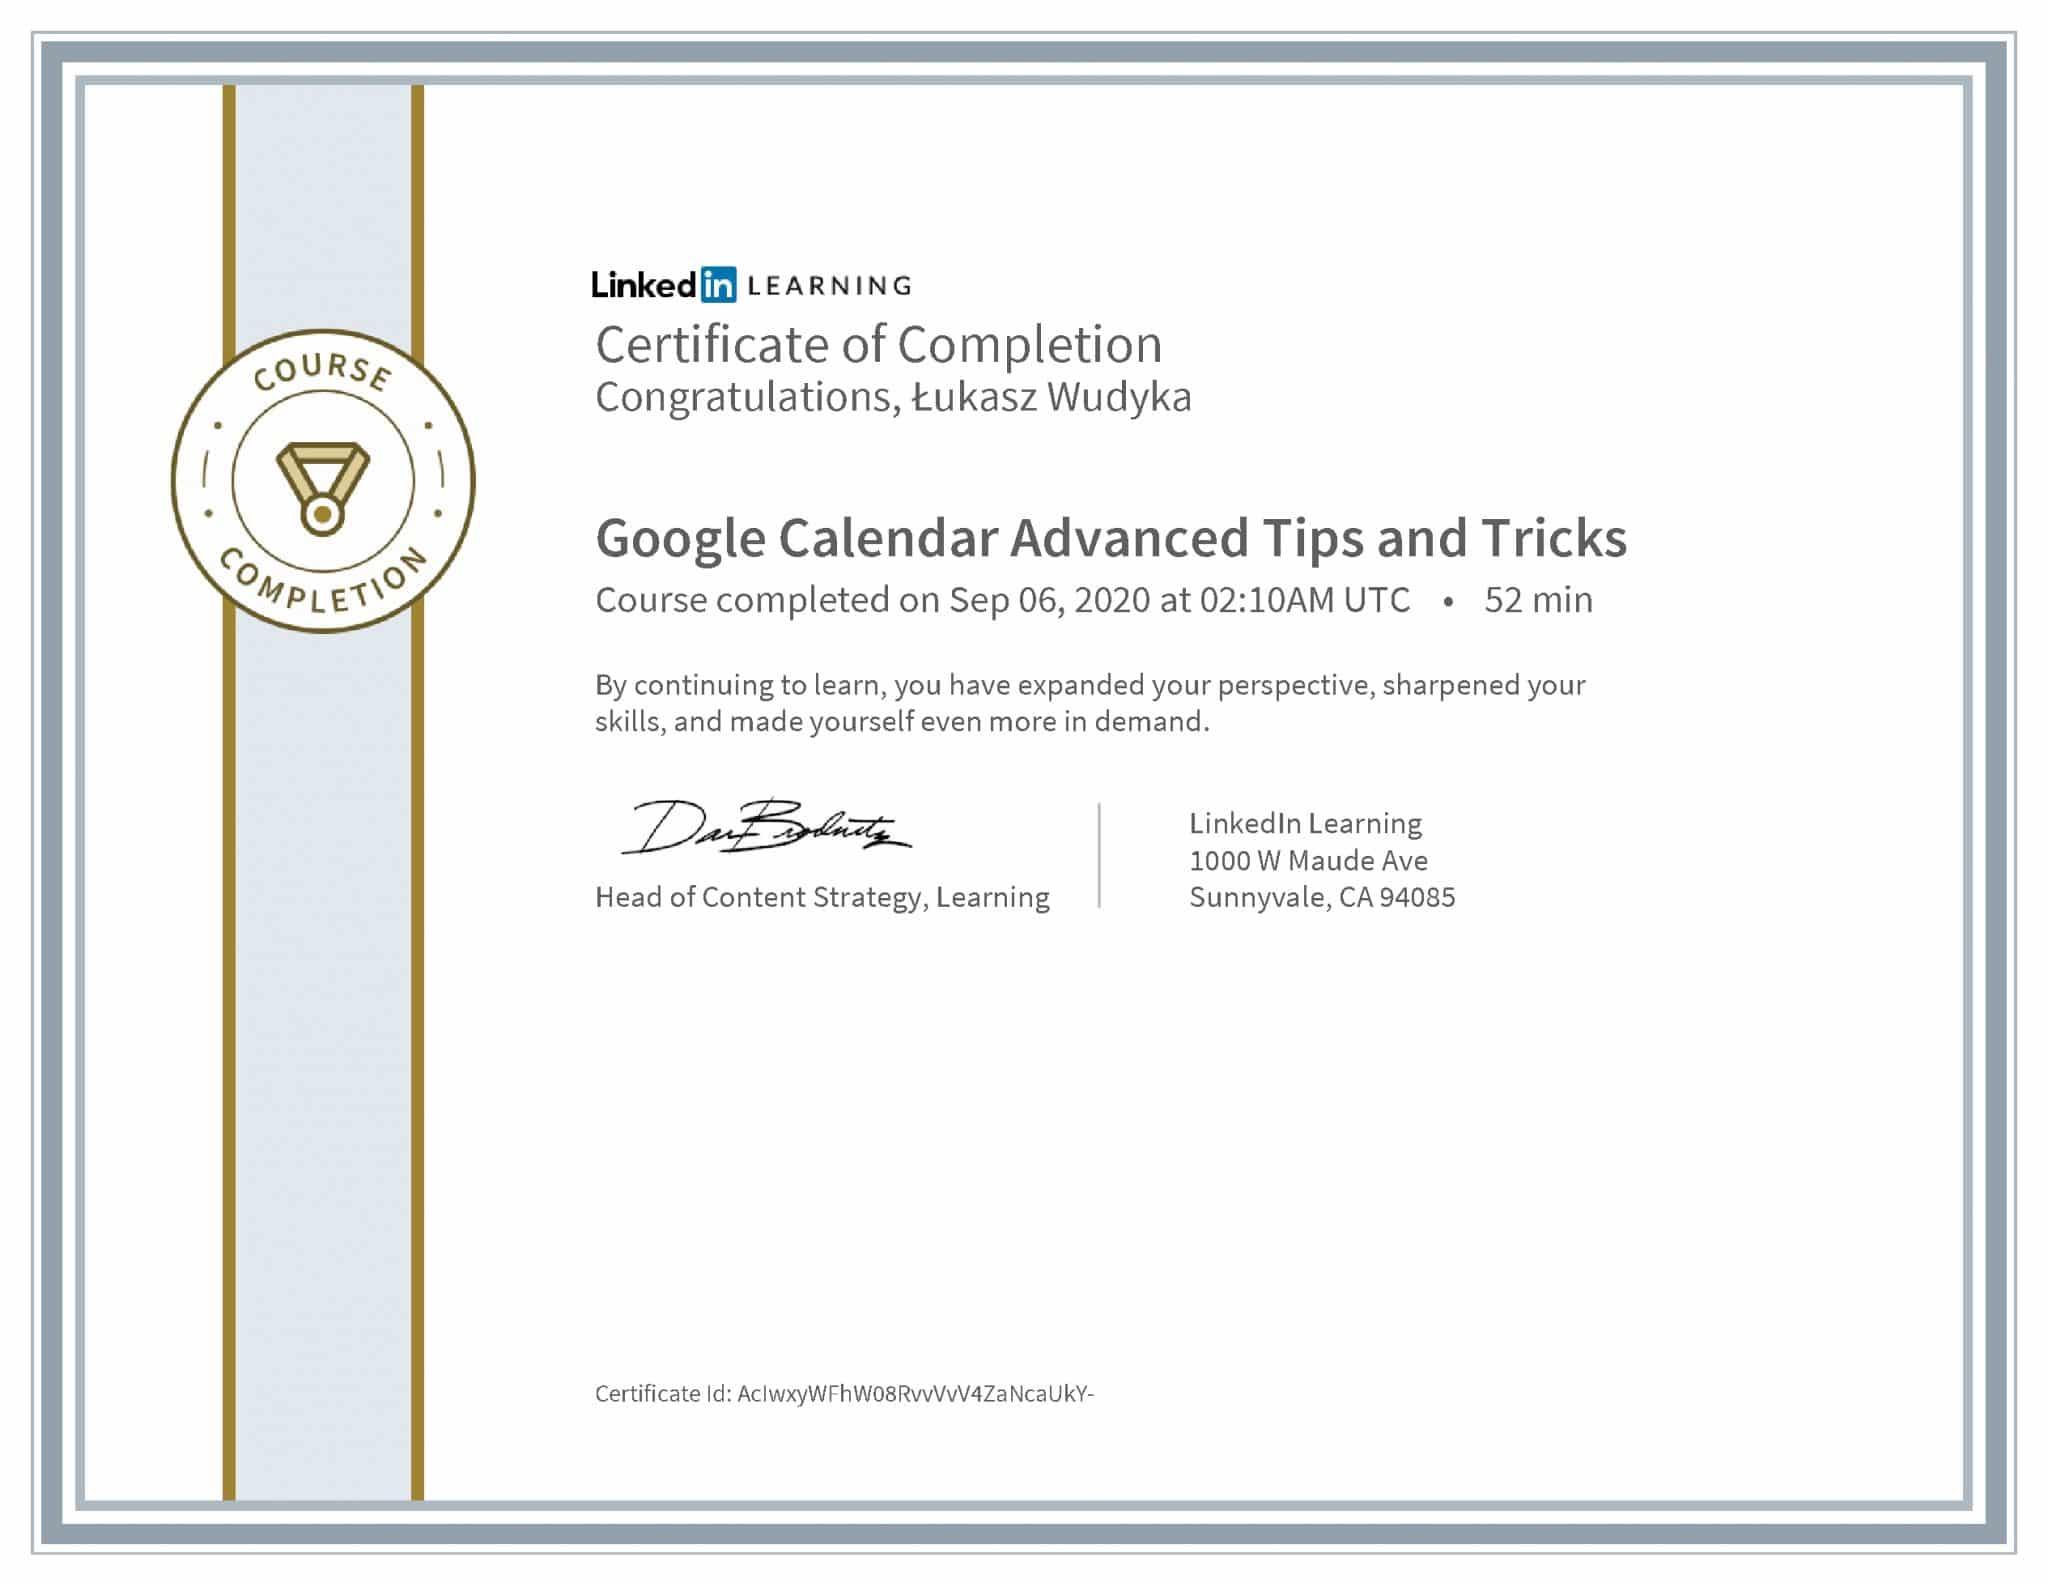 Łukasz Wudyka certyfikat LinkedIn Google Calendar Advanced Tips and Tricks